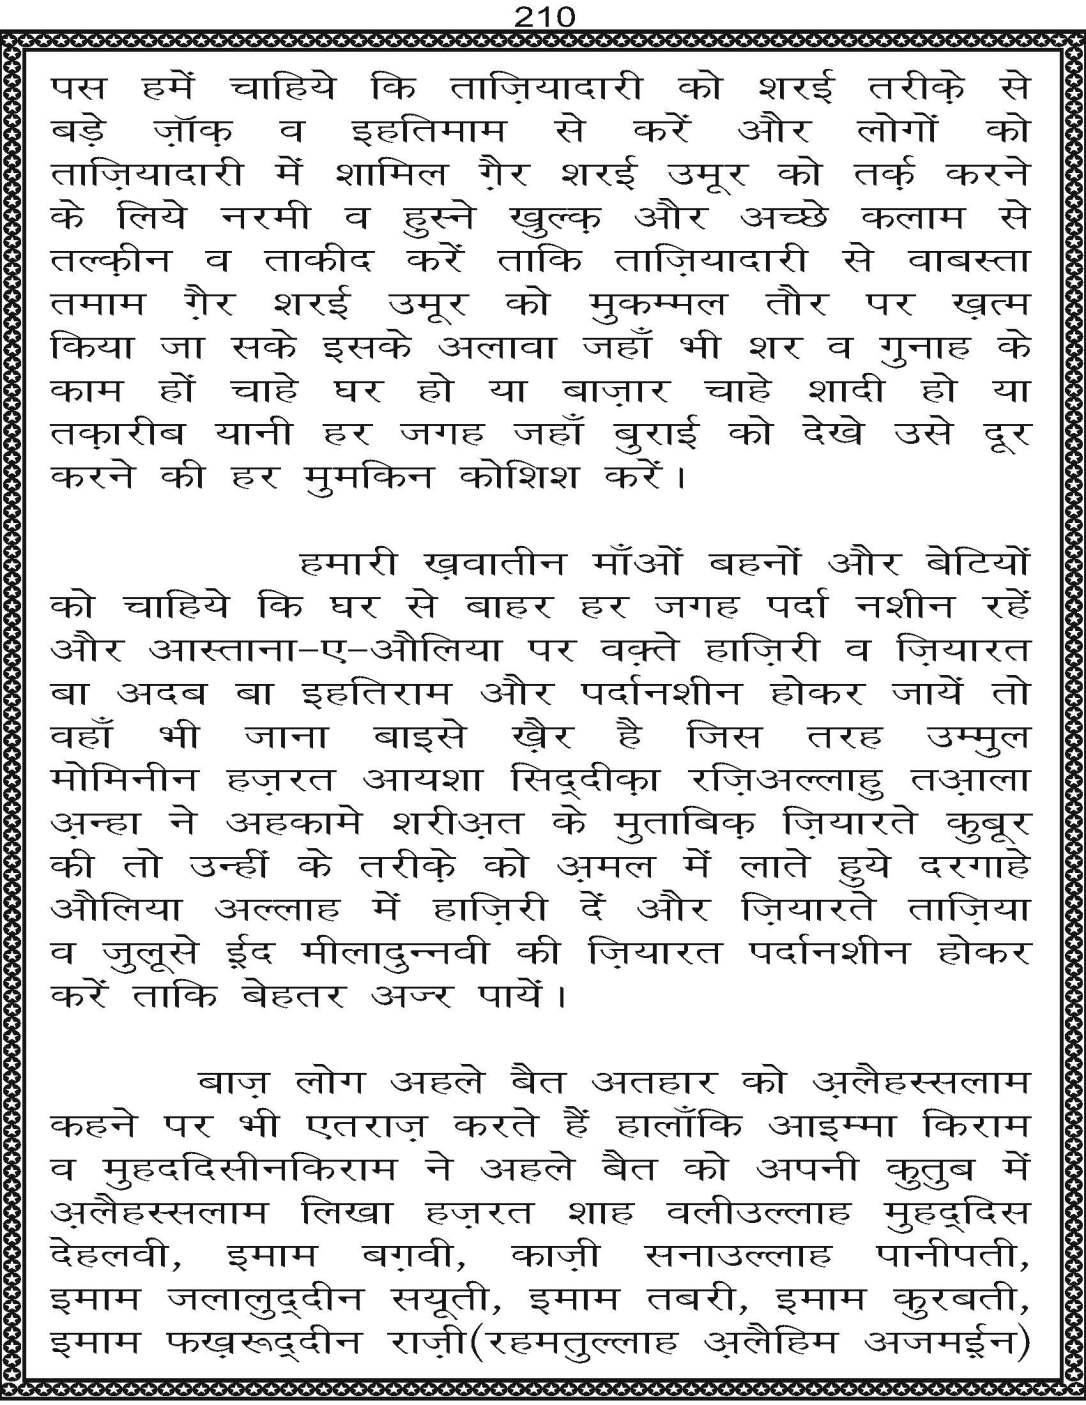 AzmateTaziyadari_Page_210